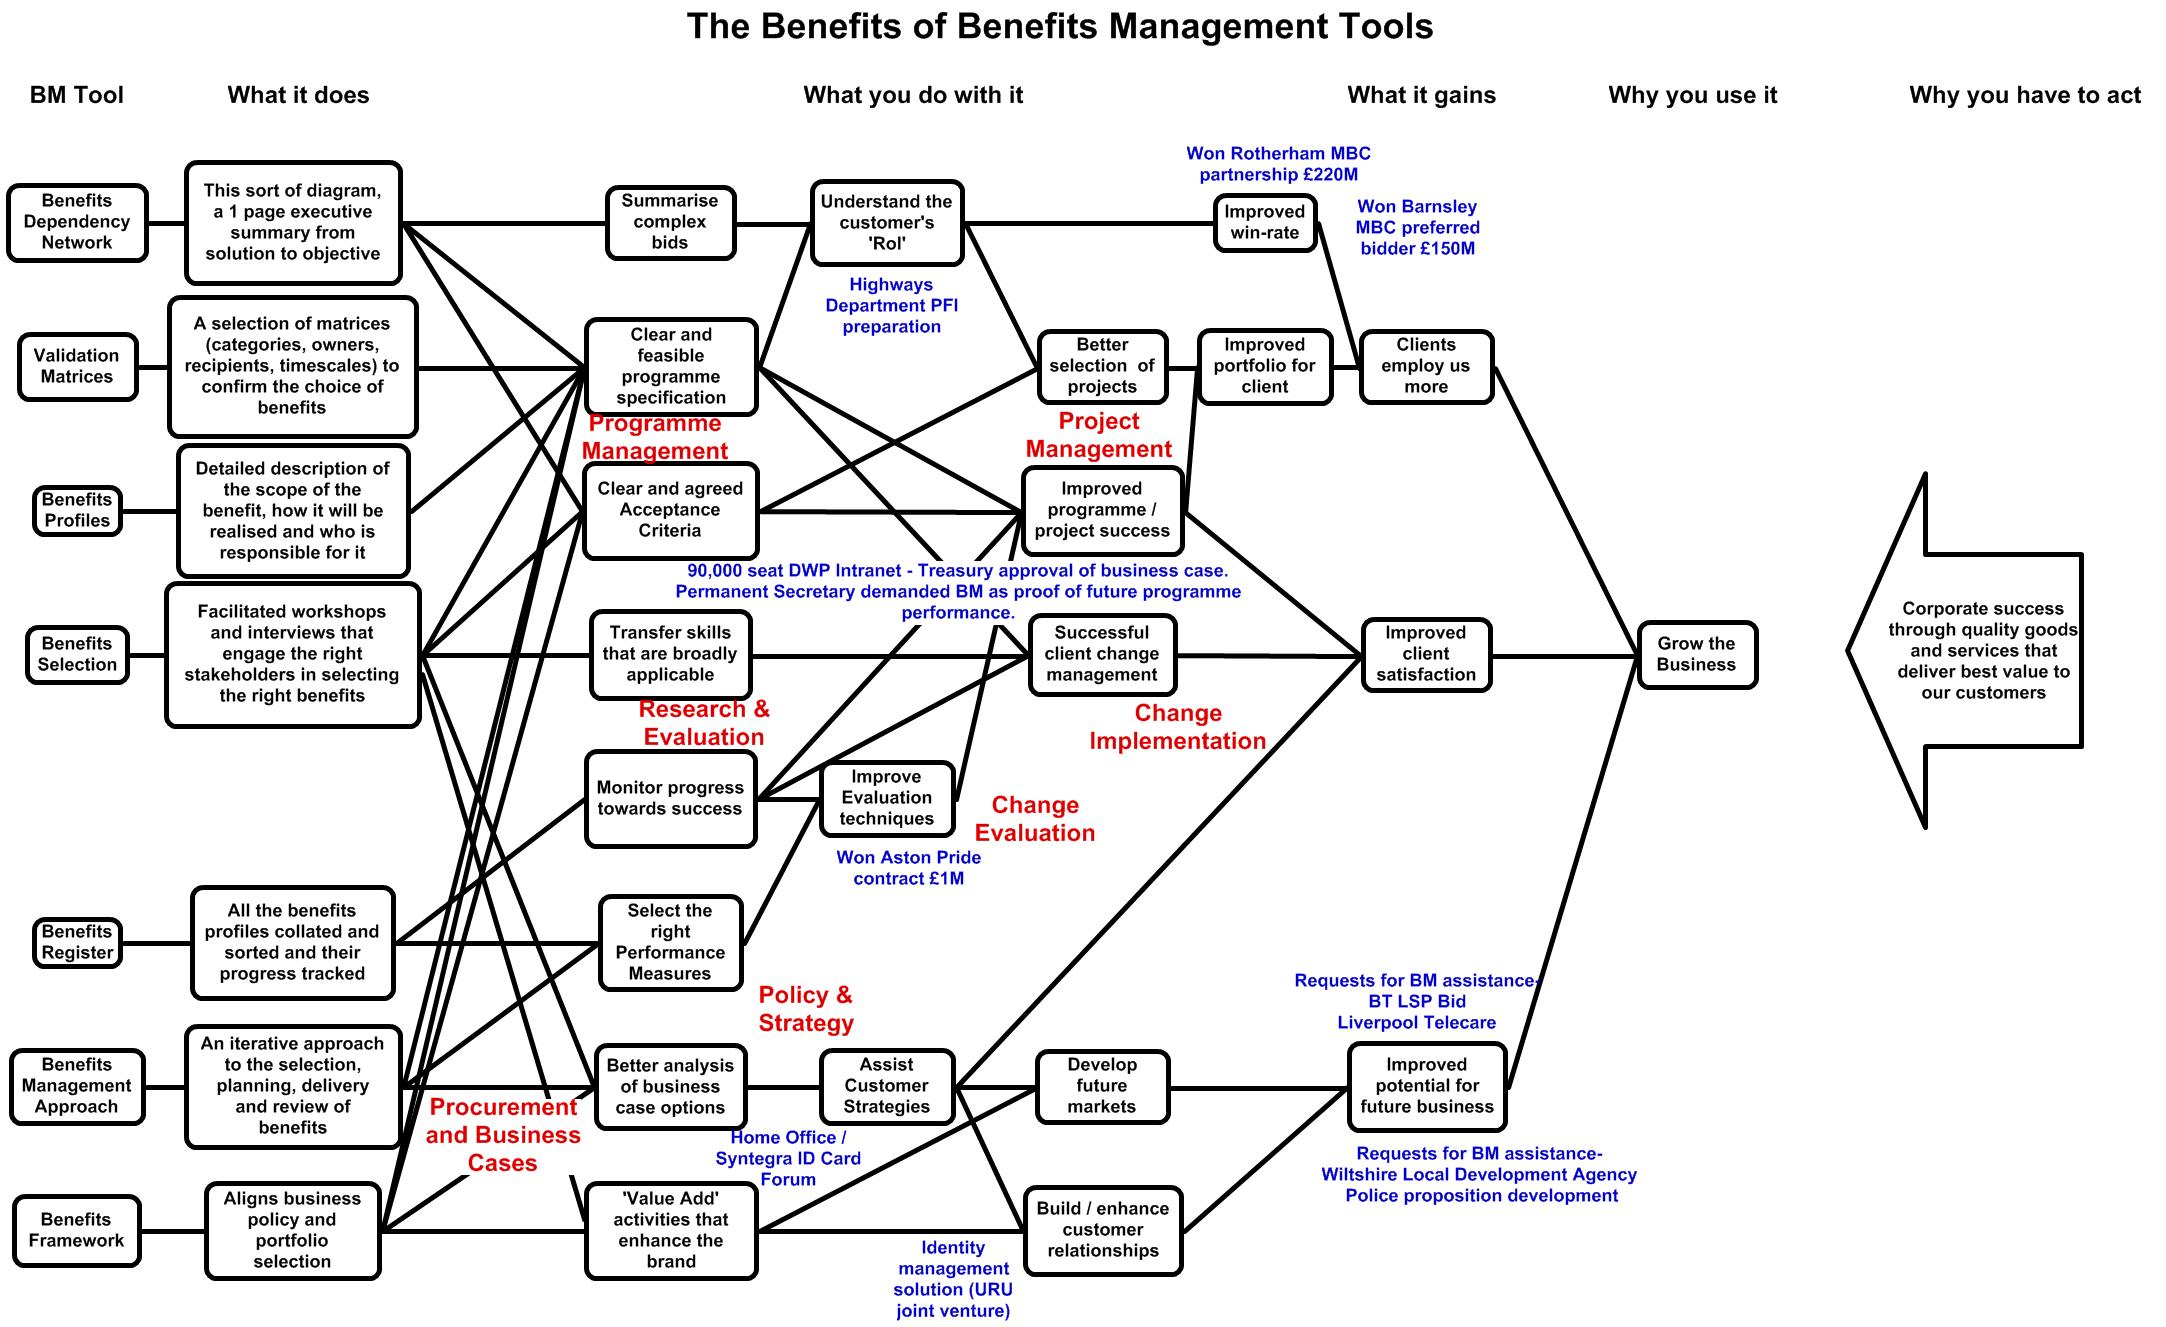 The Benefits of BM